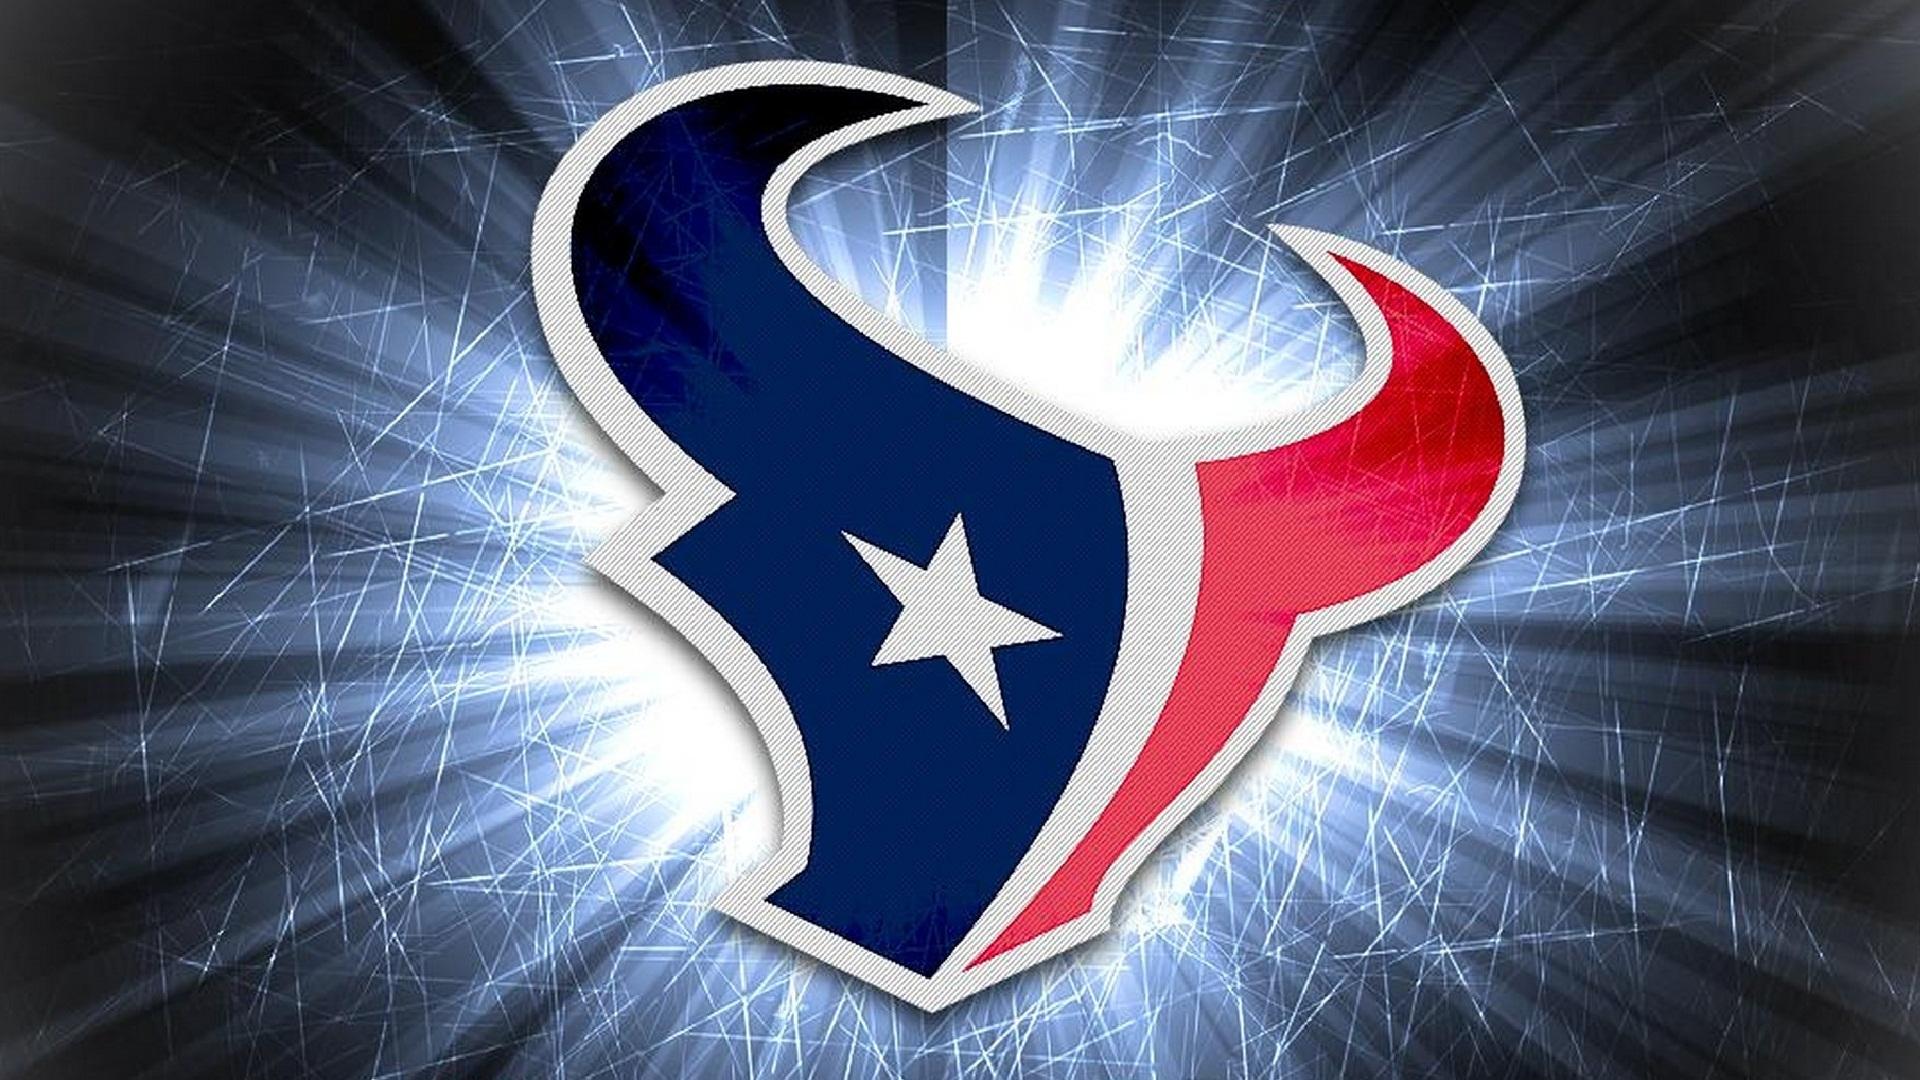 Houston Texans Iphone Wallpaper Houston Texans Hd Wallpapers 2019 Nfl Football Wallpapers